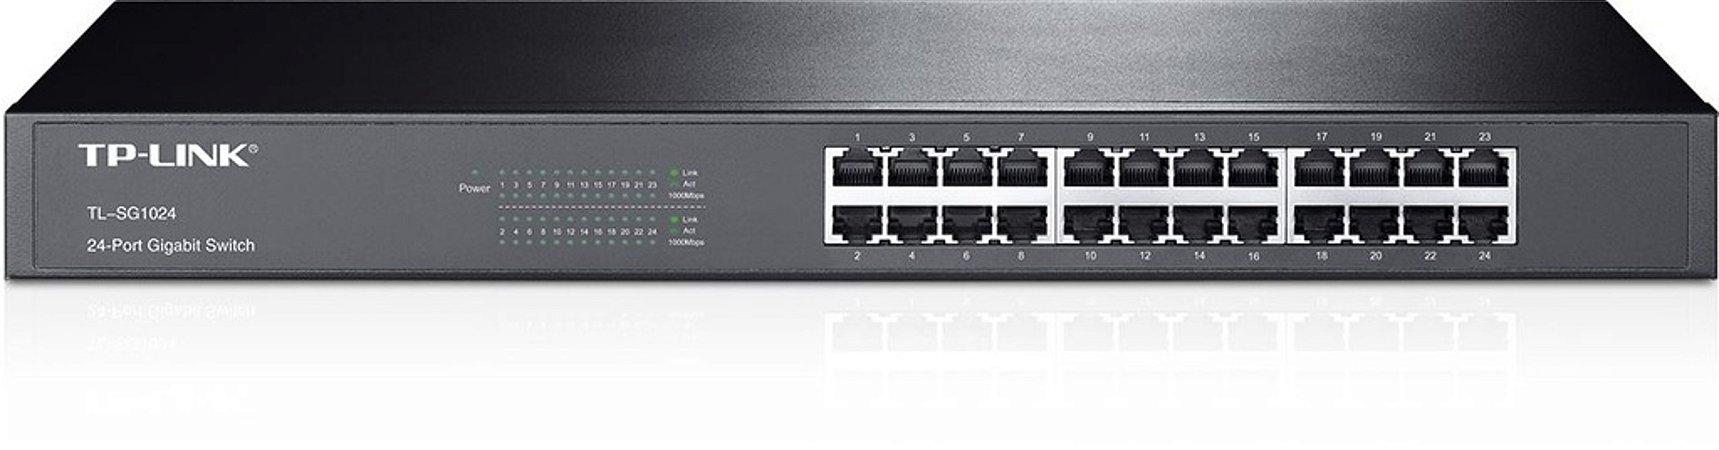 Switch 24 portas Gigabit Rackmount TP-Link TL-SG1024